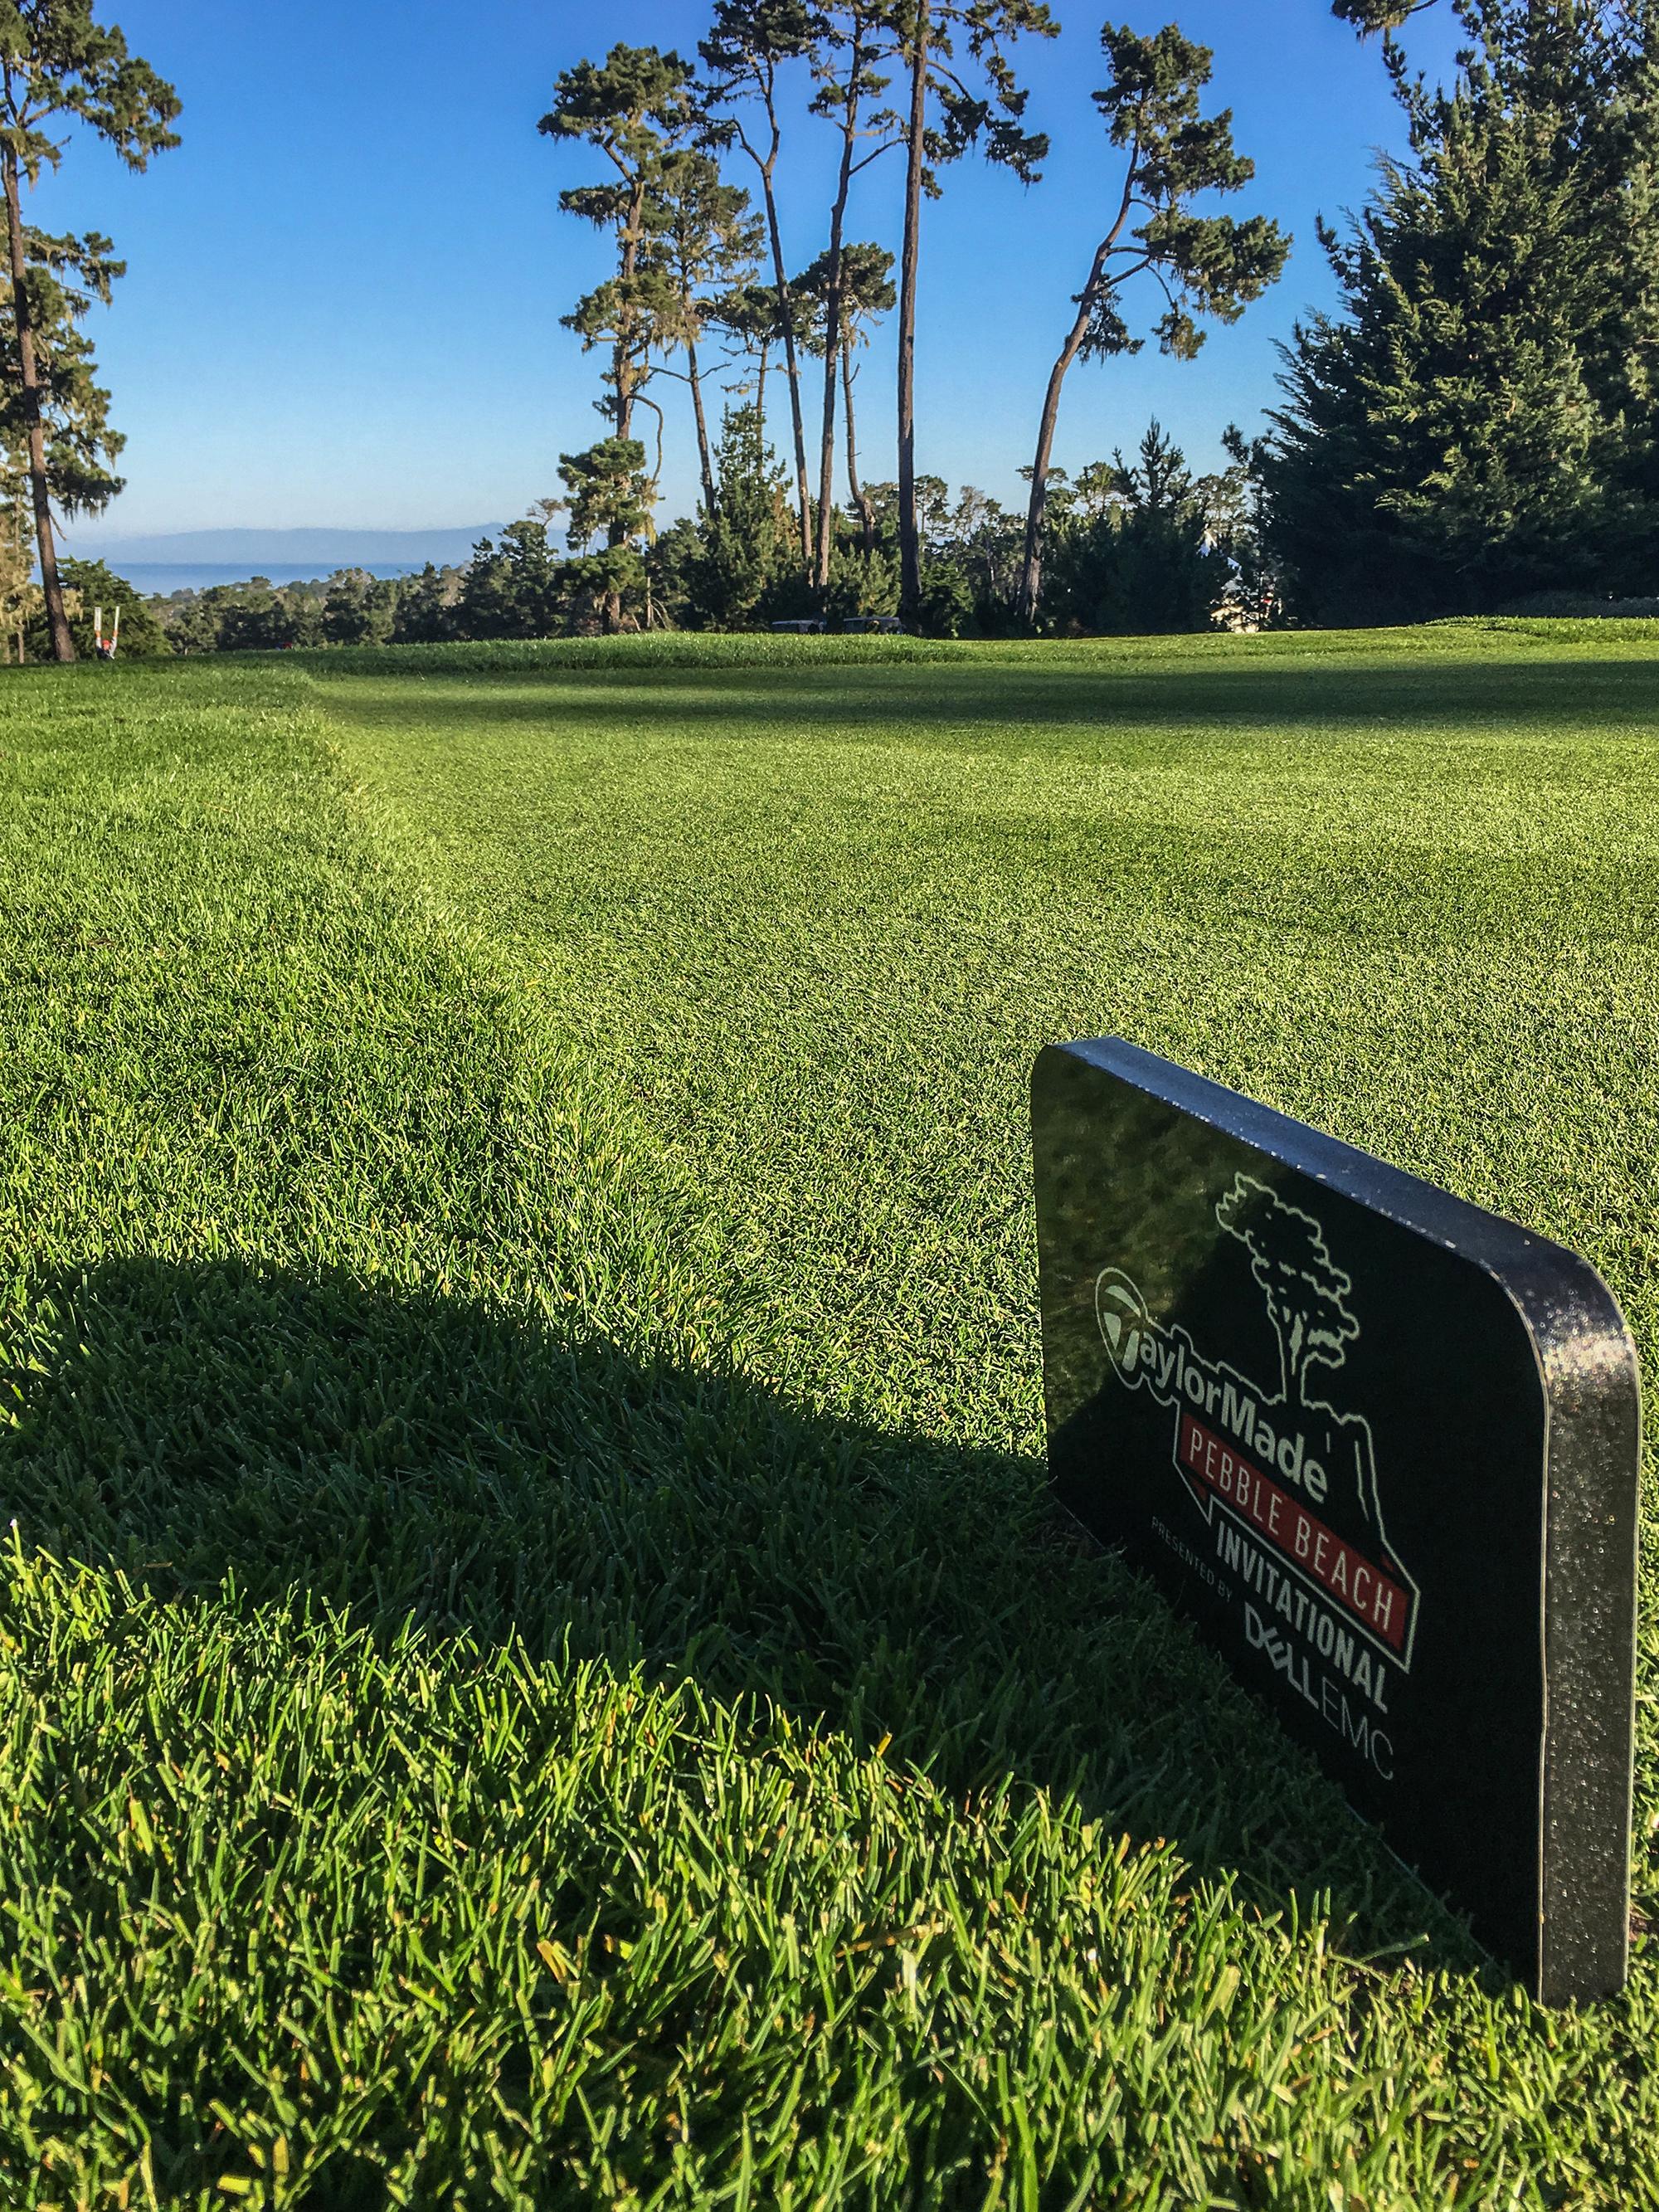 TaylorMade Pebble Beach Invitational marker